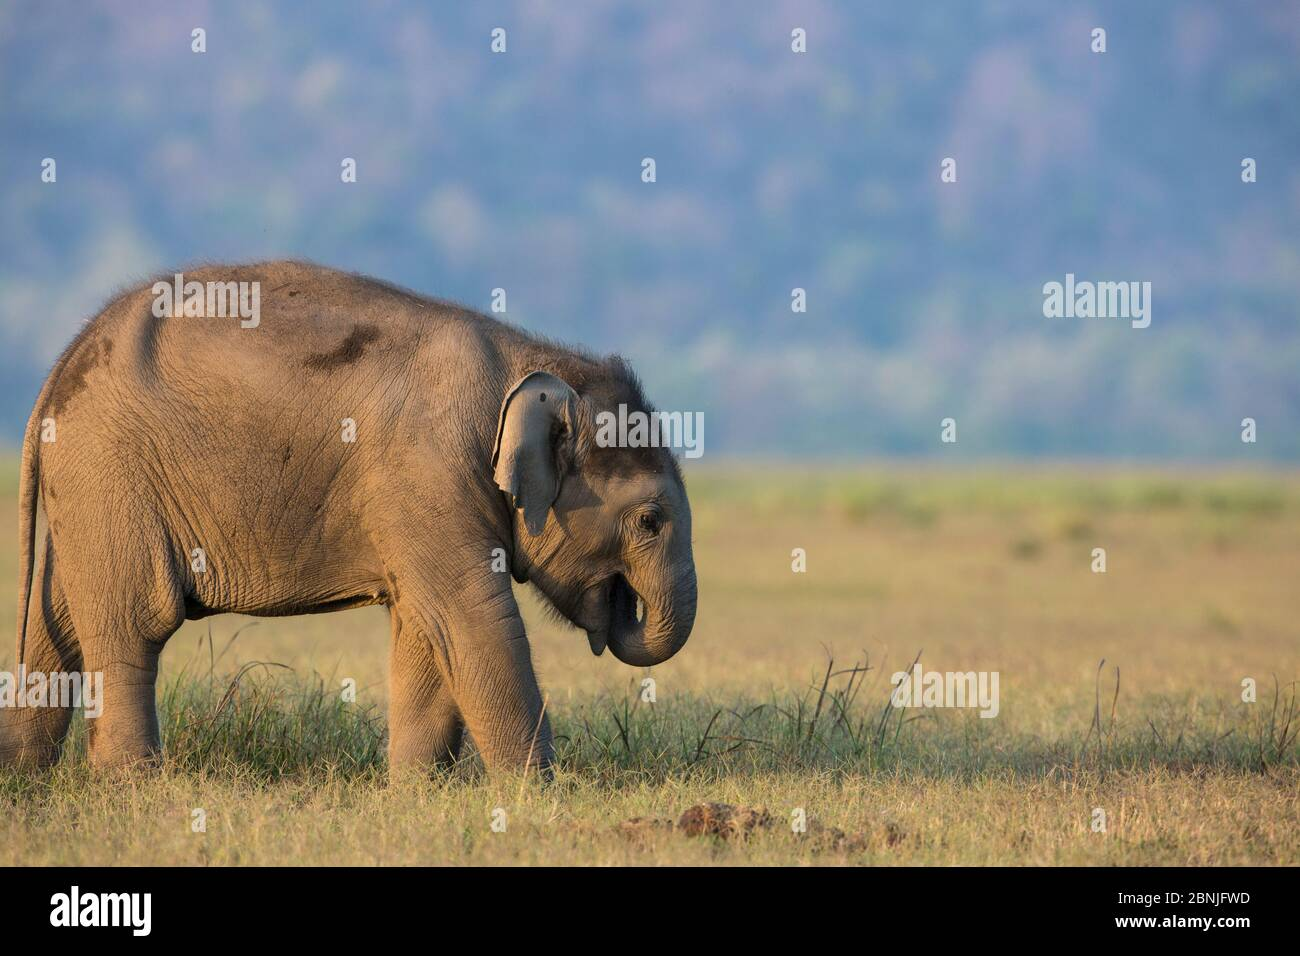 Asiatic elephant (Elephas maximus), young calf feeding on grass, Jim Corbett National Park, India. Stock Photo